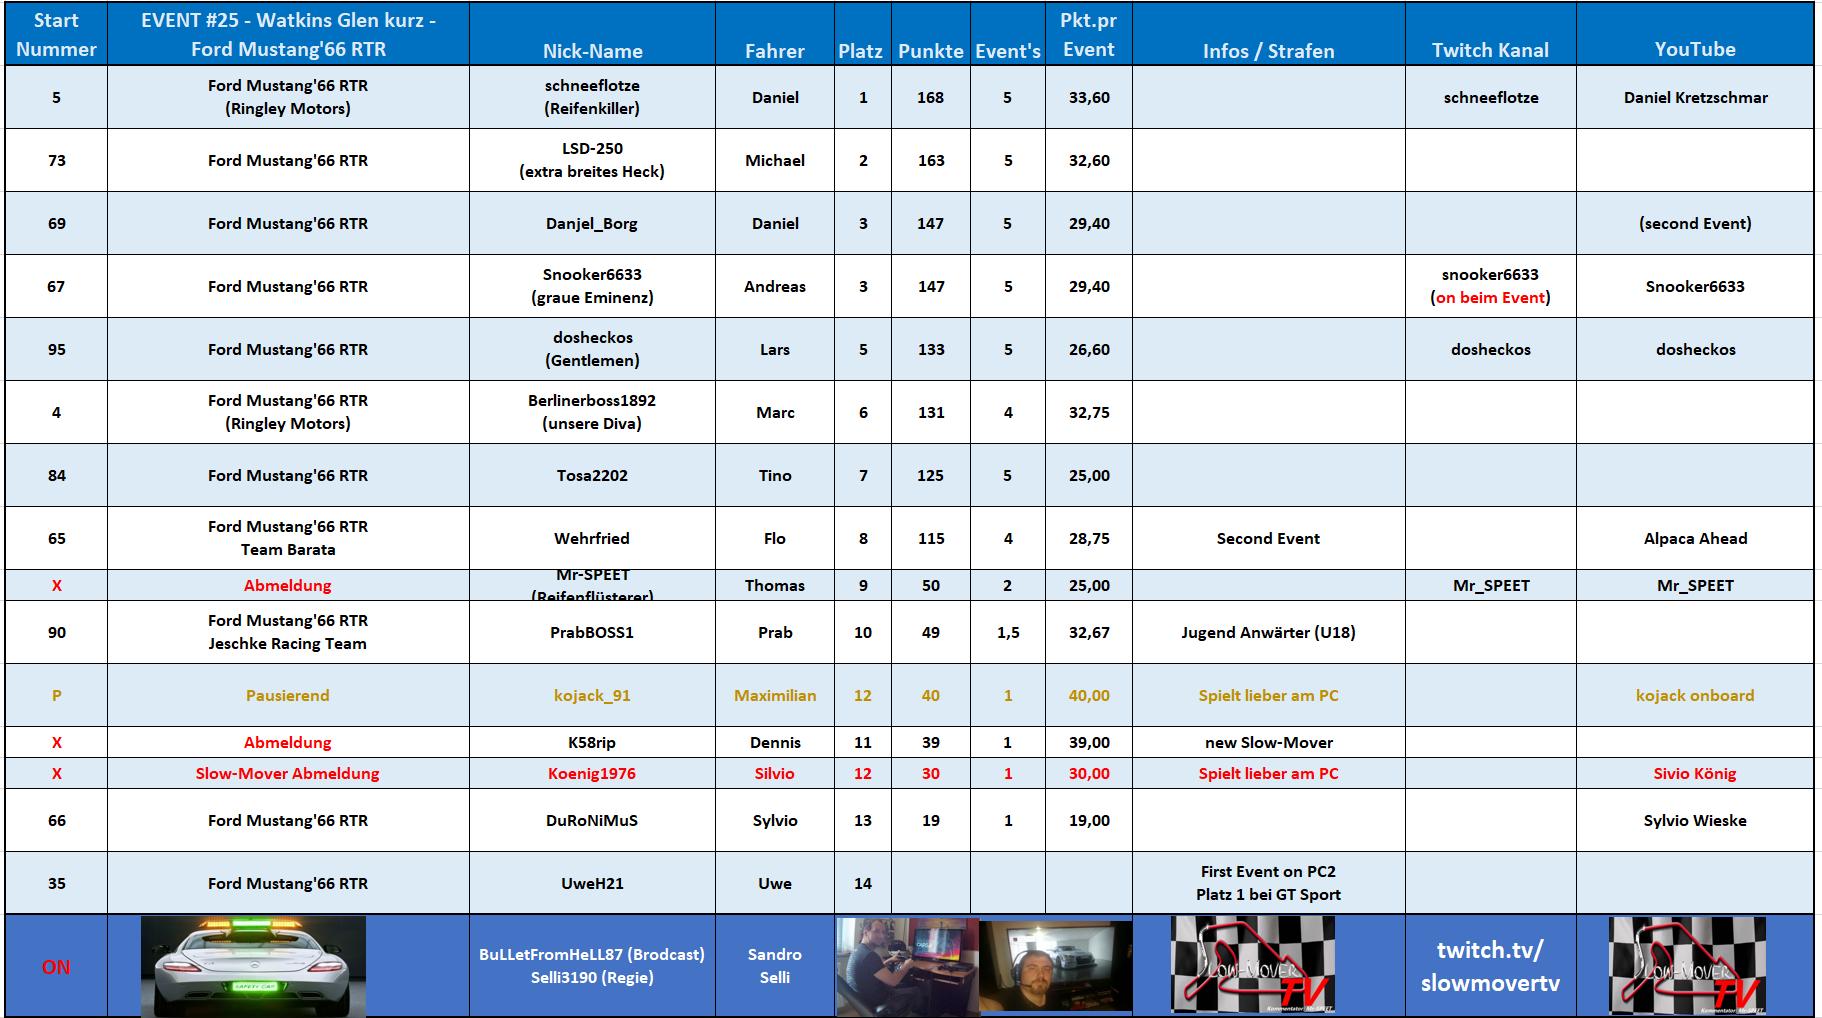 025 Watkins Glen short - Ford Mustang '66 RTR - Snooker6633 (19.05.2019)